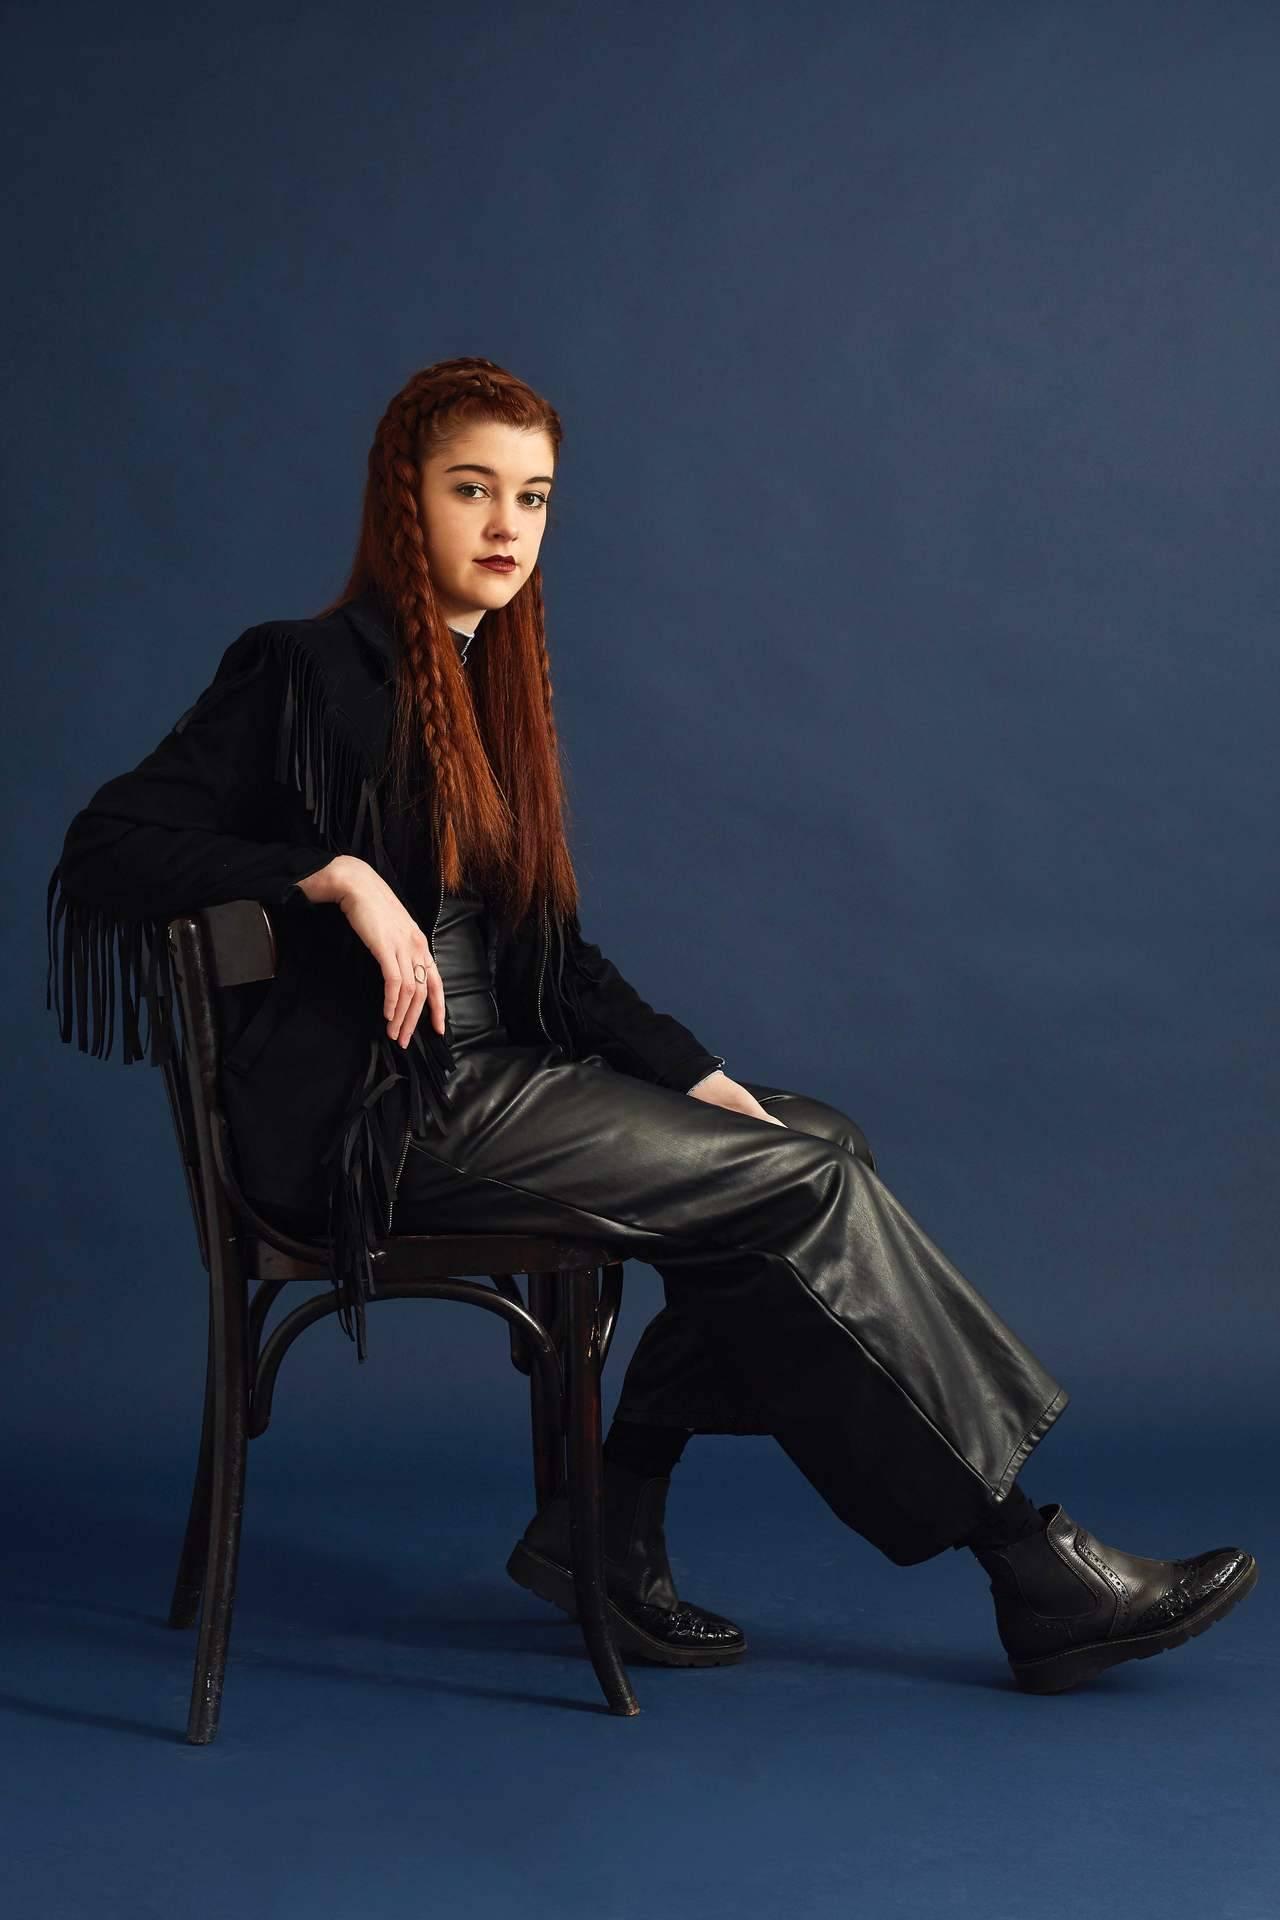 She Makes Music — Piroshka performing live at Studio 9294 in